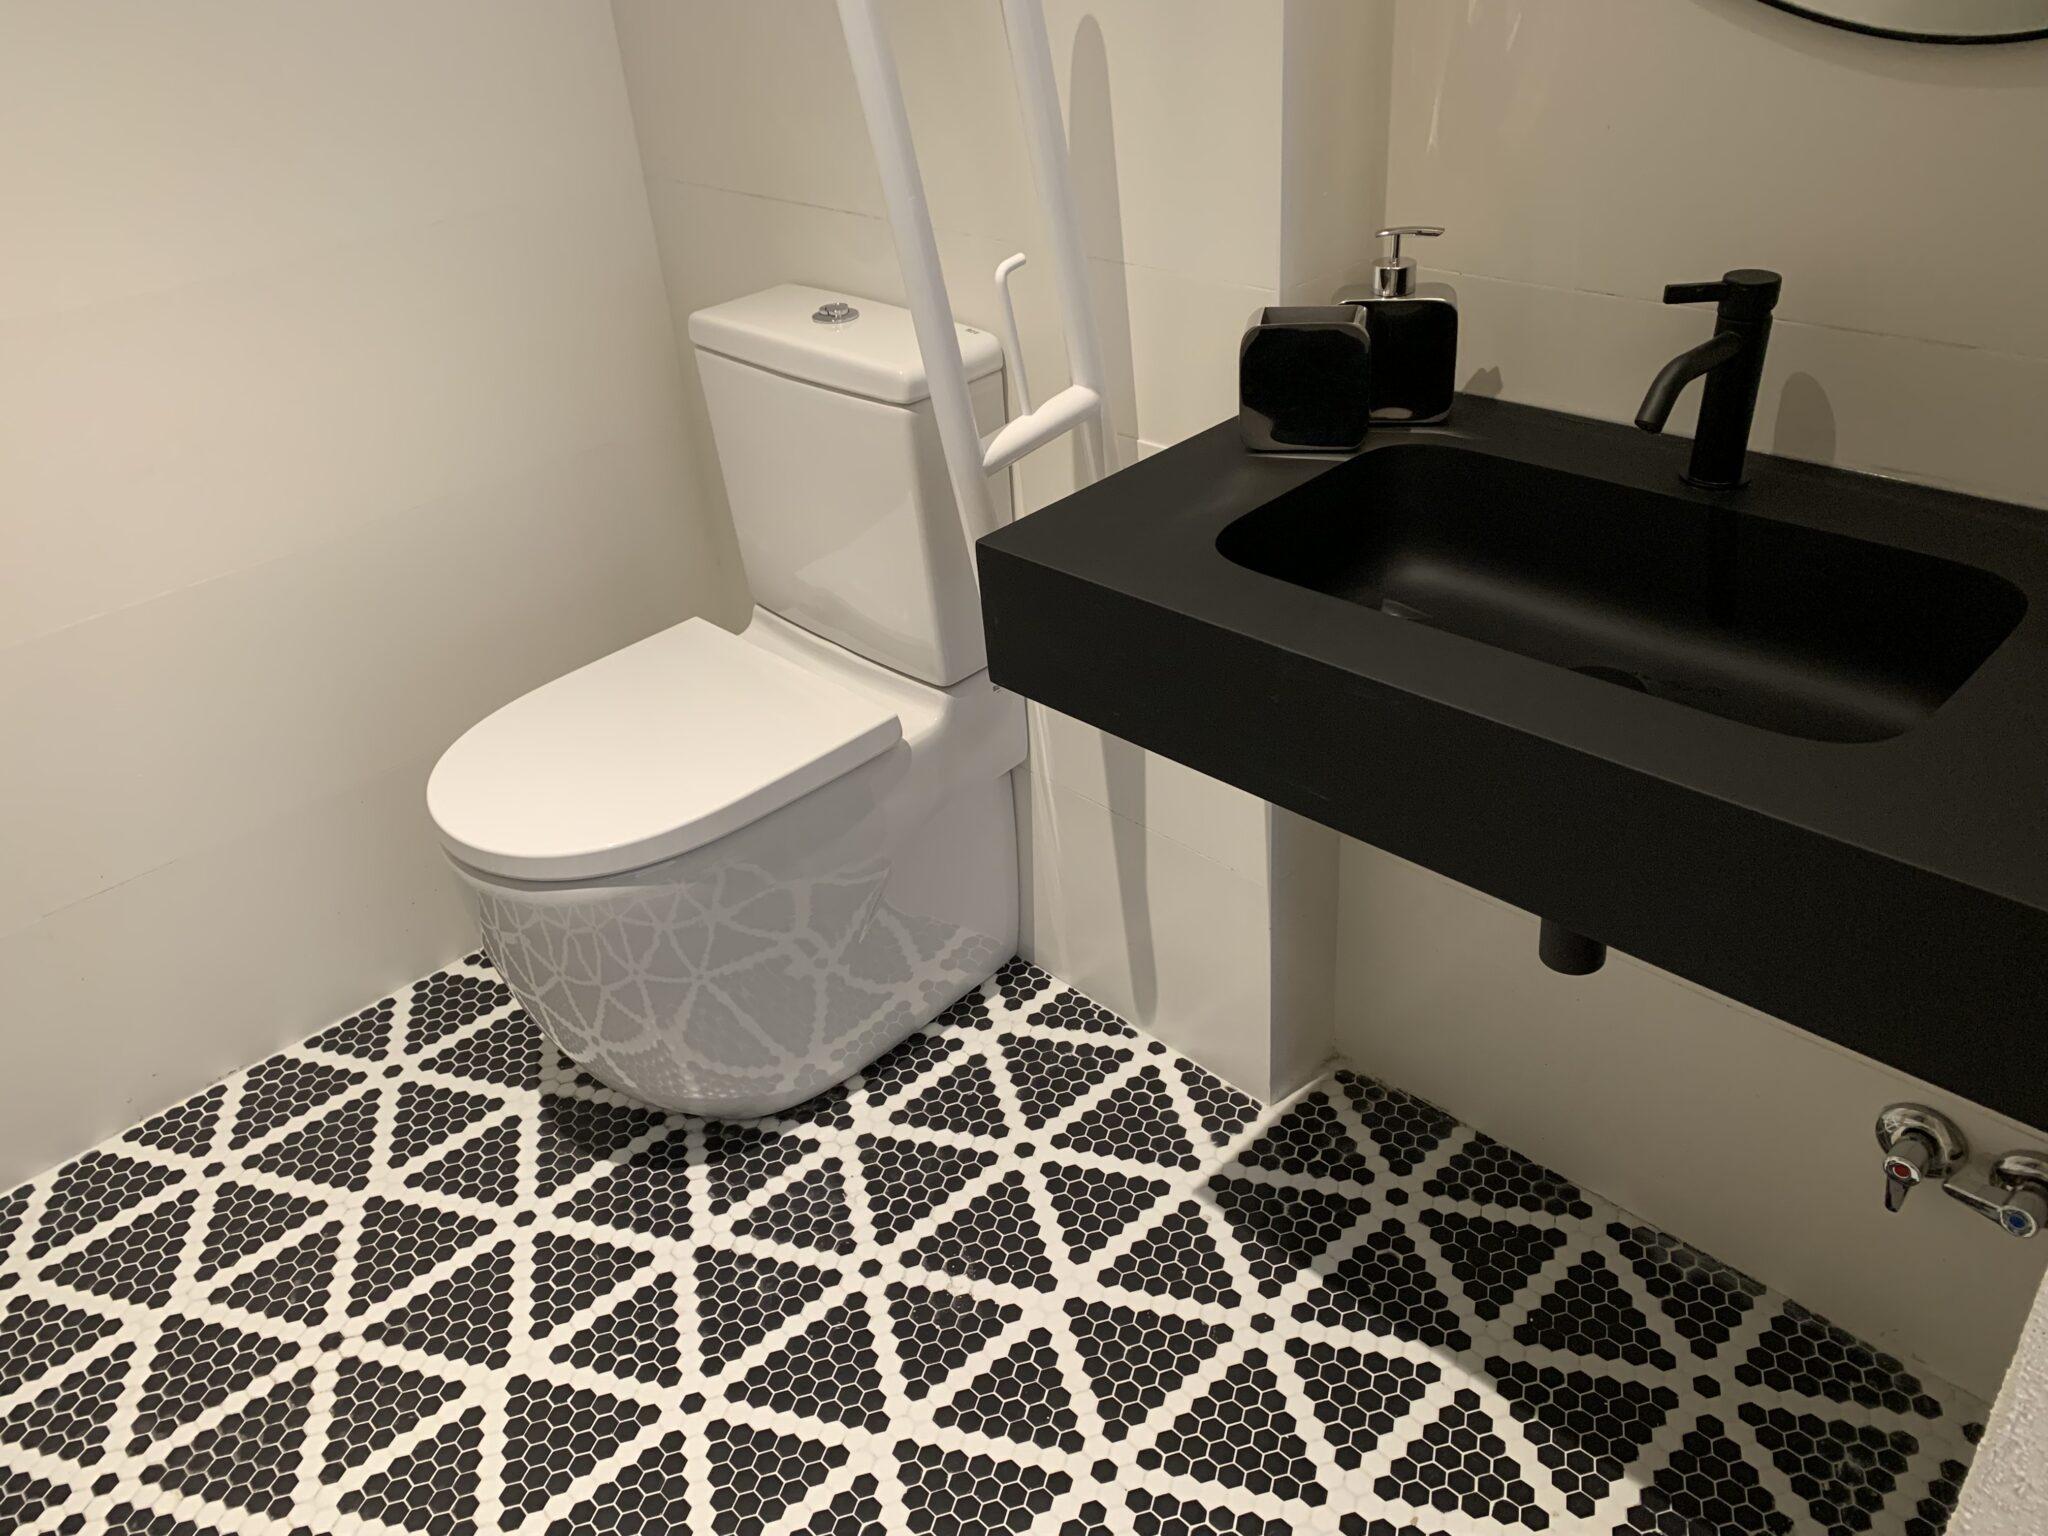 Proyecto-hisbalit-Baño adaptado con suelo Sonata | Ducha | Black & White-baNo sonata black white hotel arimune baNo adaptado 6